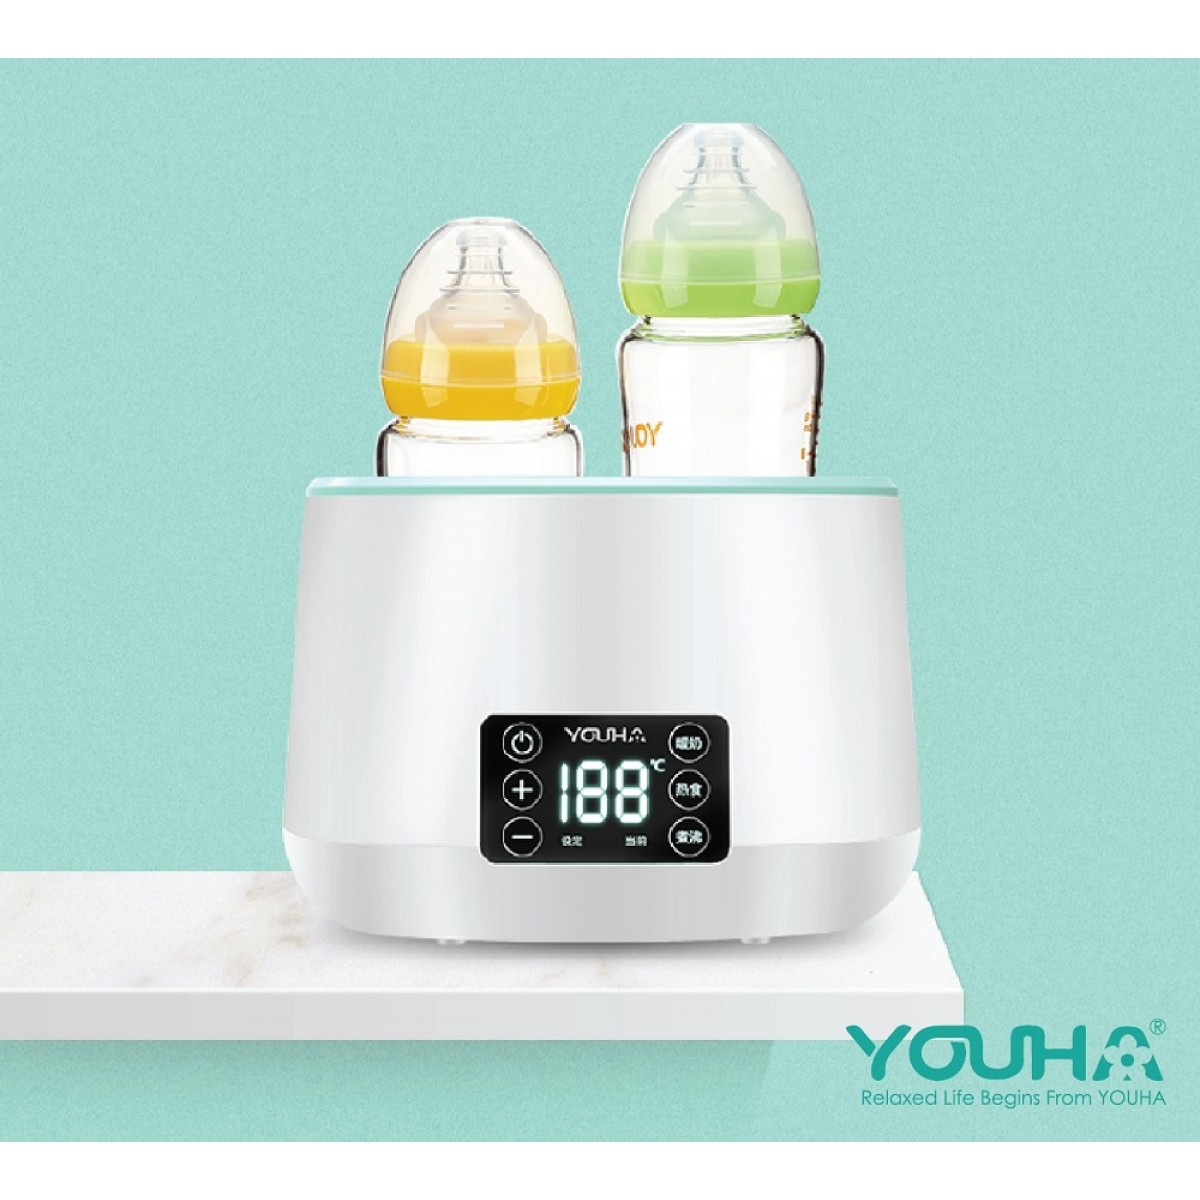 YOUHA Digital Double Baby Milk Warmer